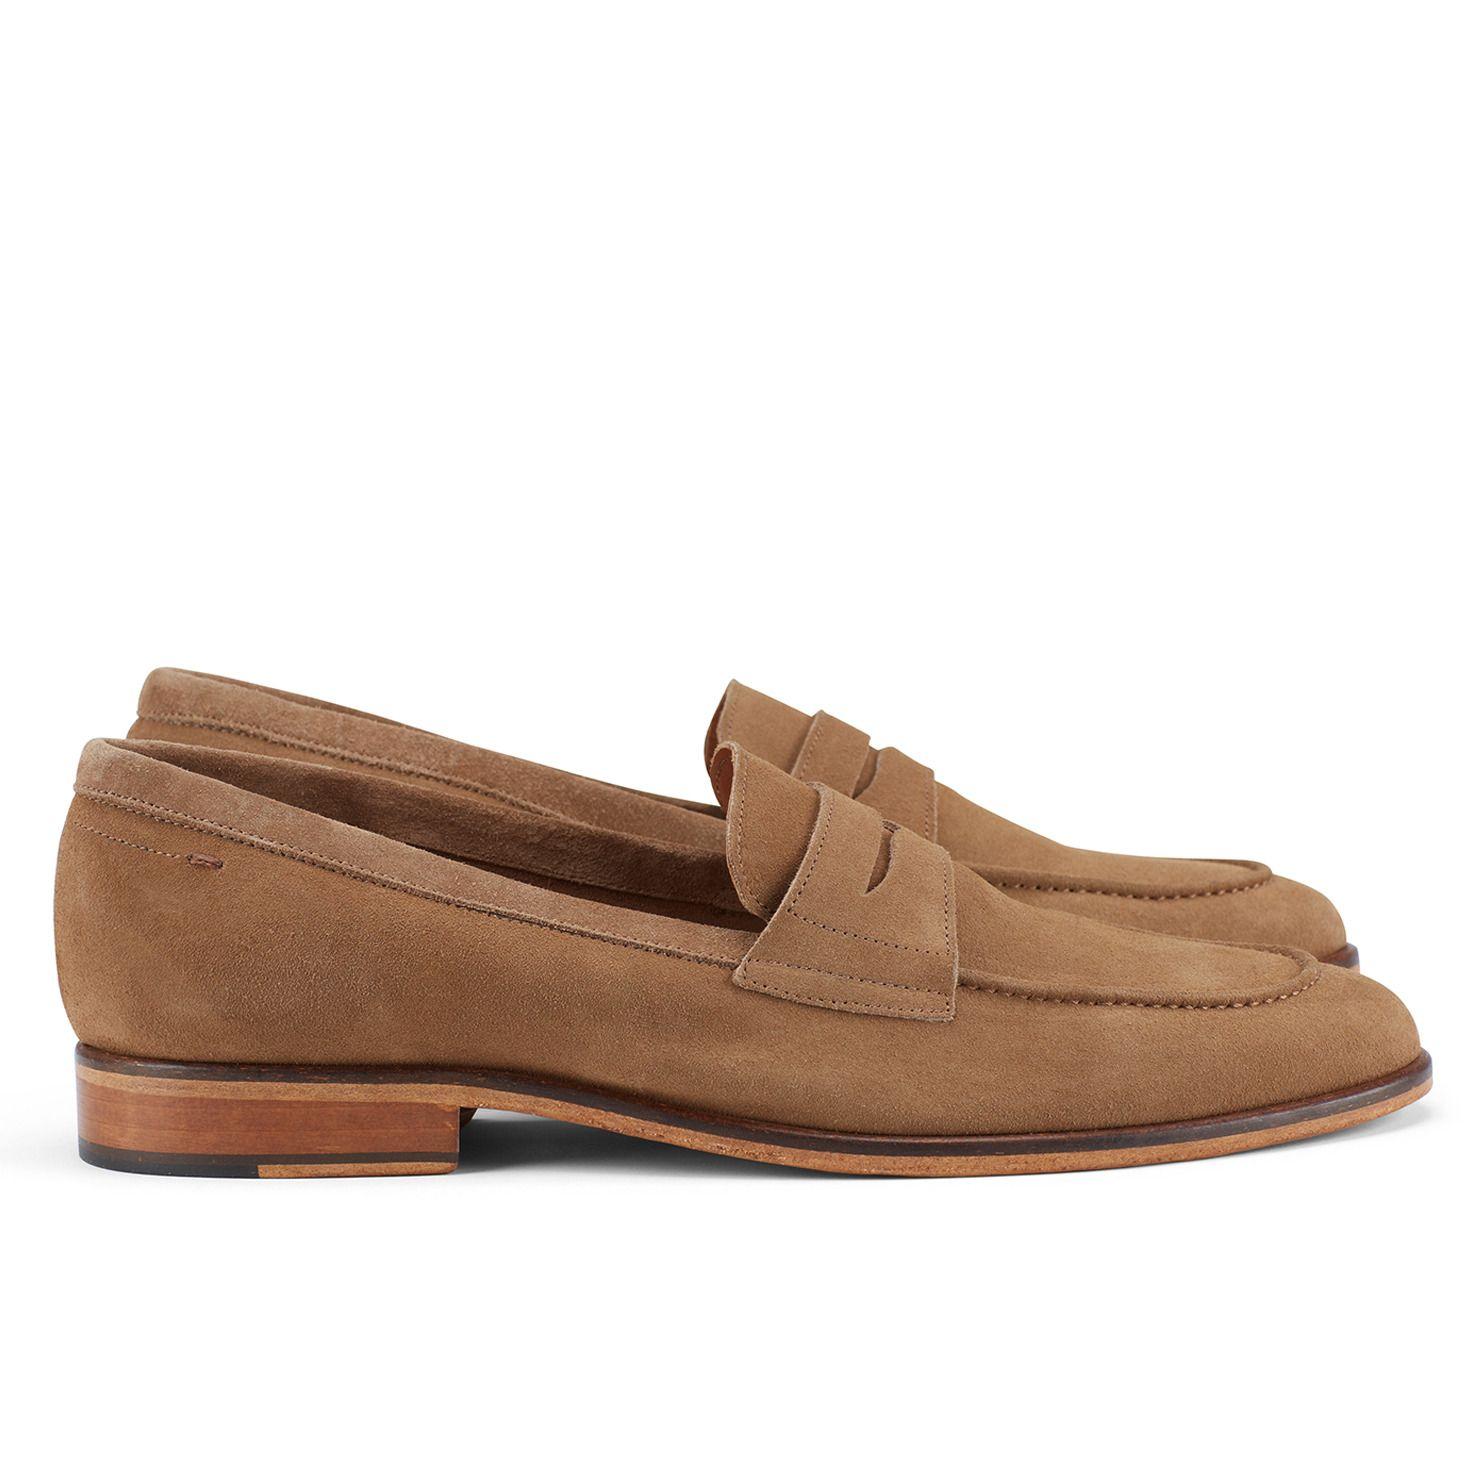 d71188a492 PODMORE - men's shoes mr. b's collection for sale at ALDO Shoes ...